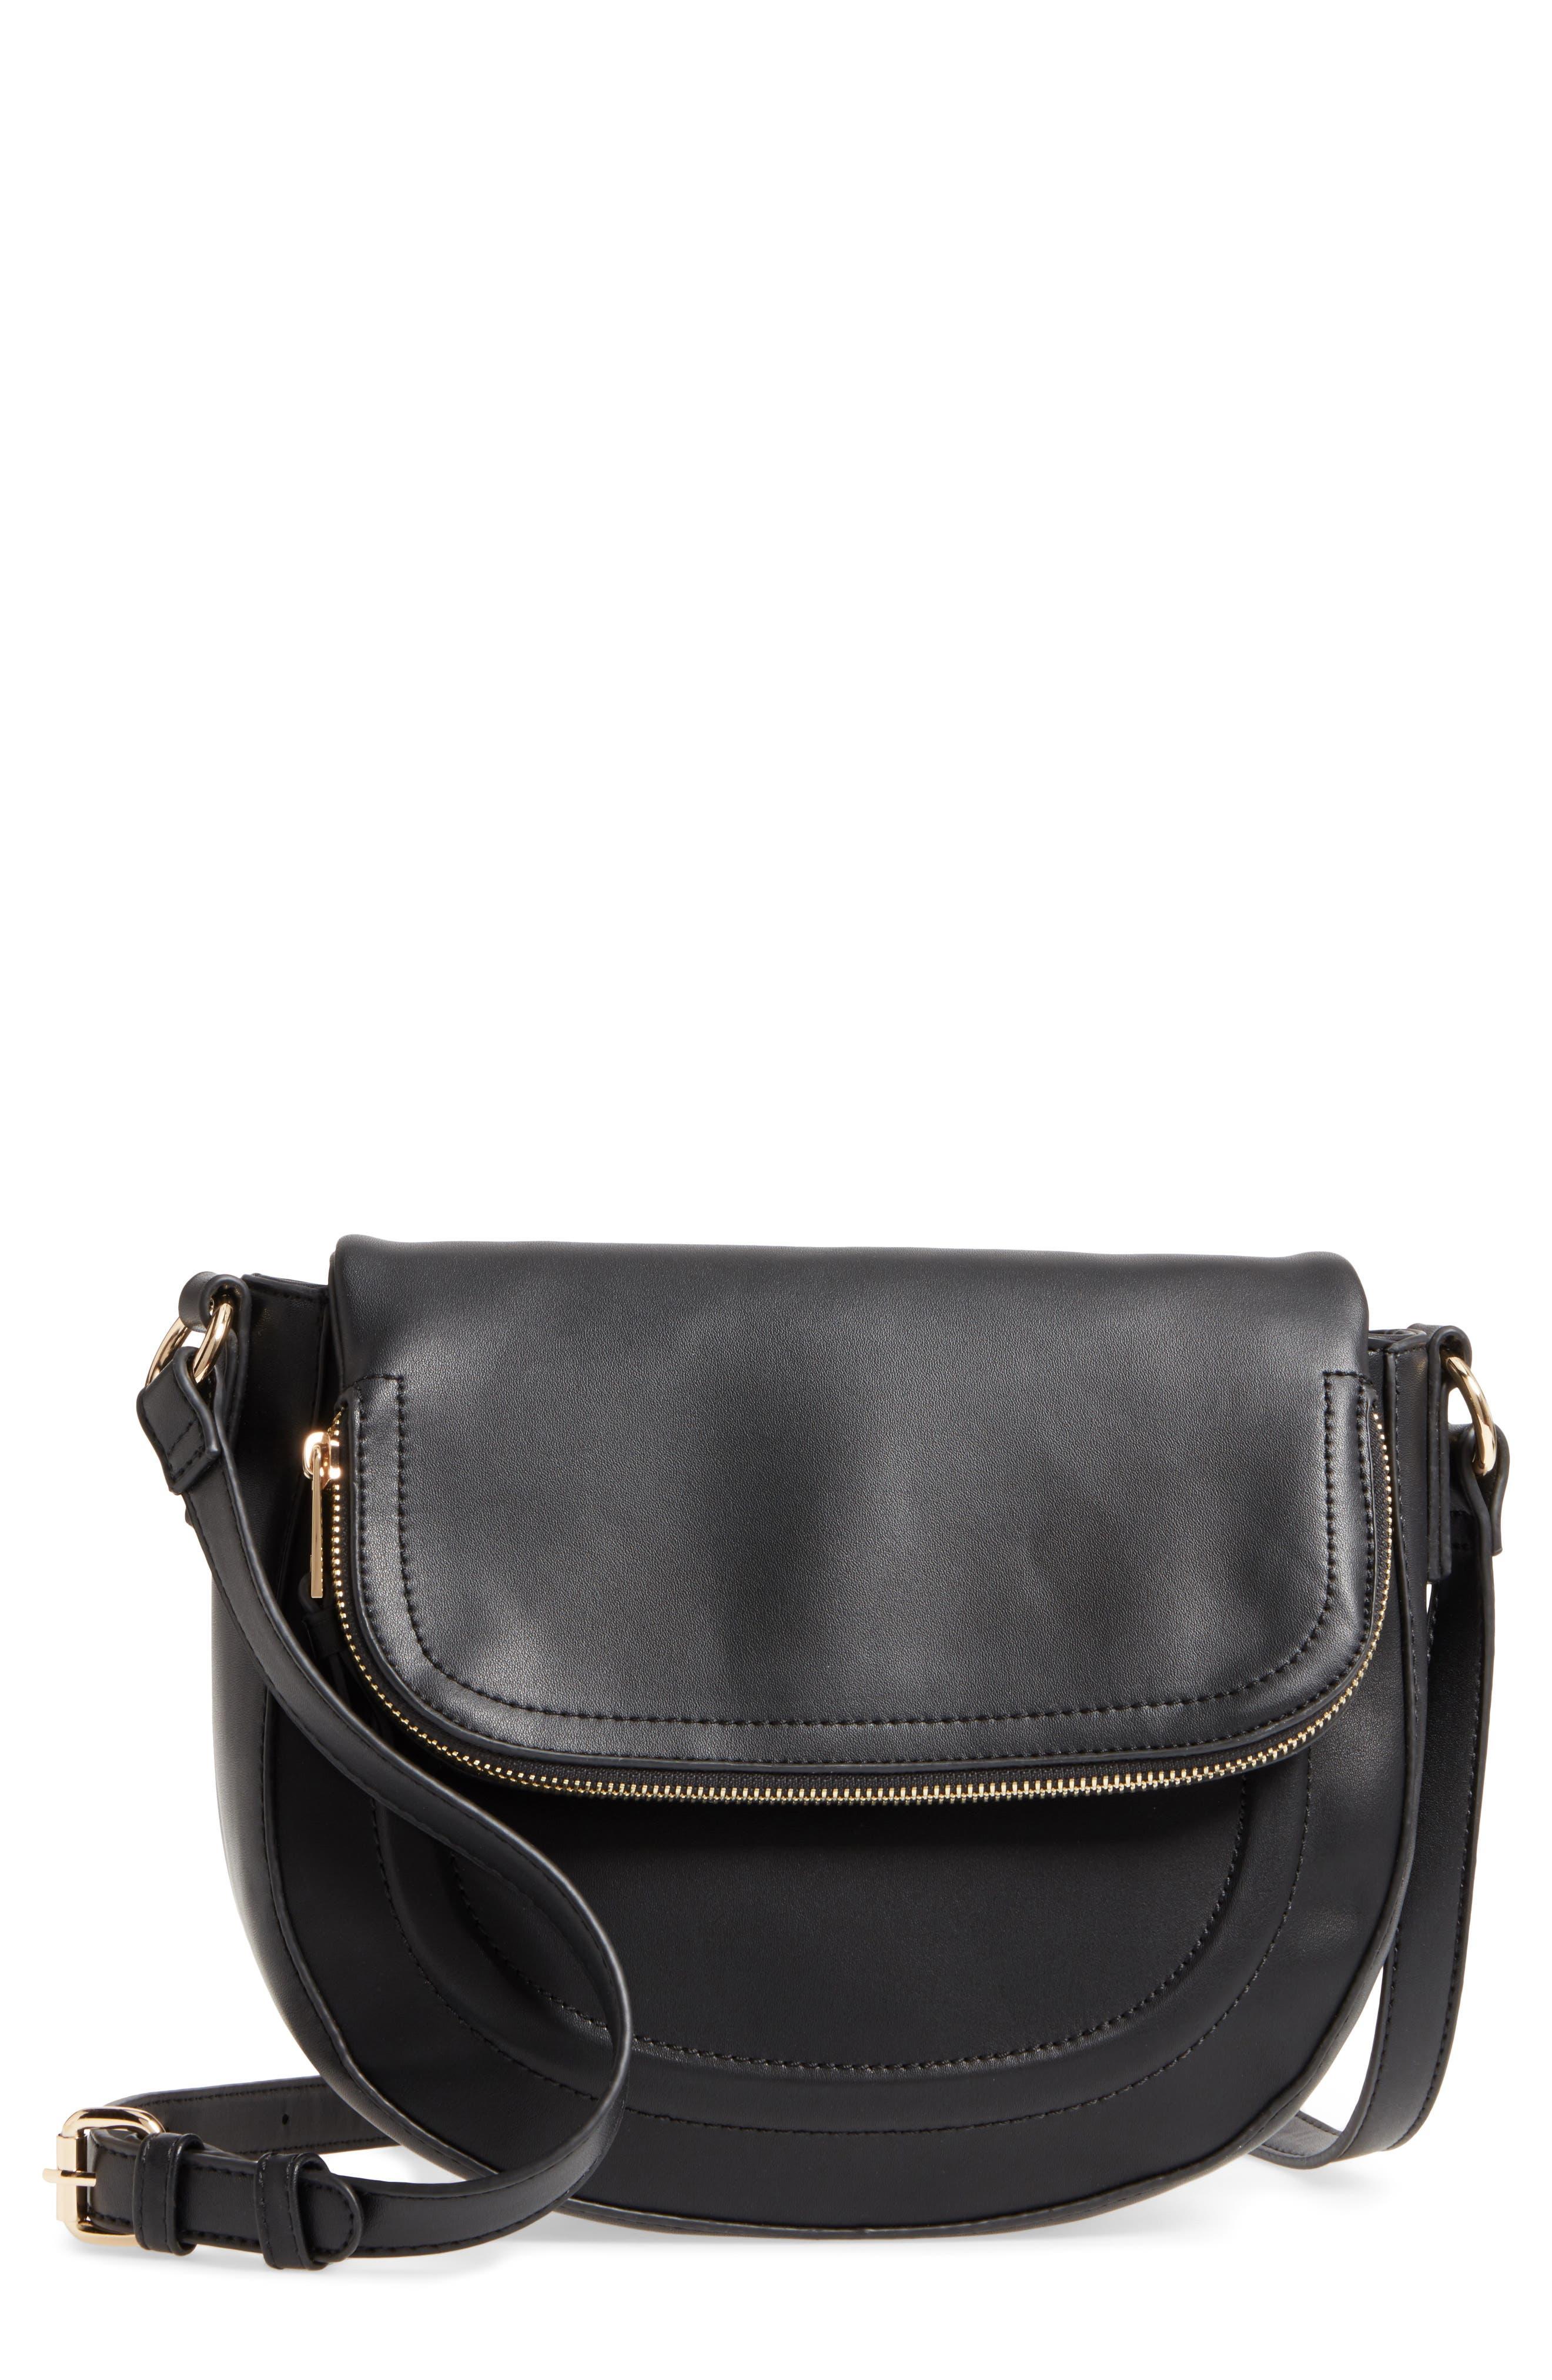 Adden Faux Leather Crossbody Bag,                             Main thumbnail 1, color,                             Black